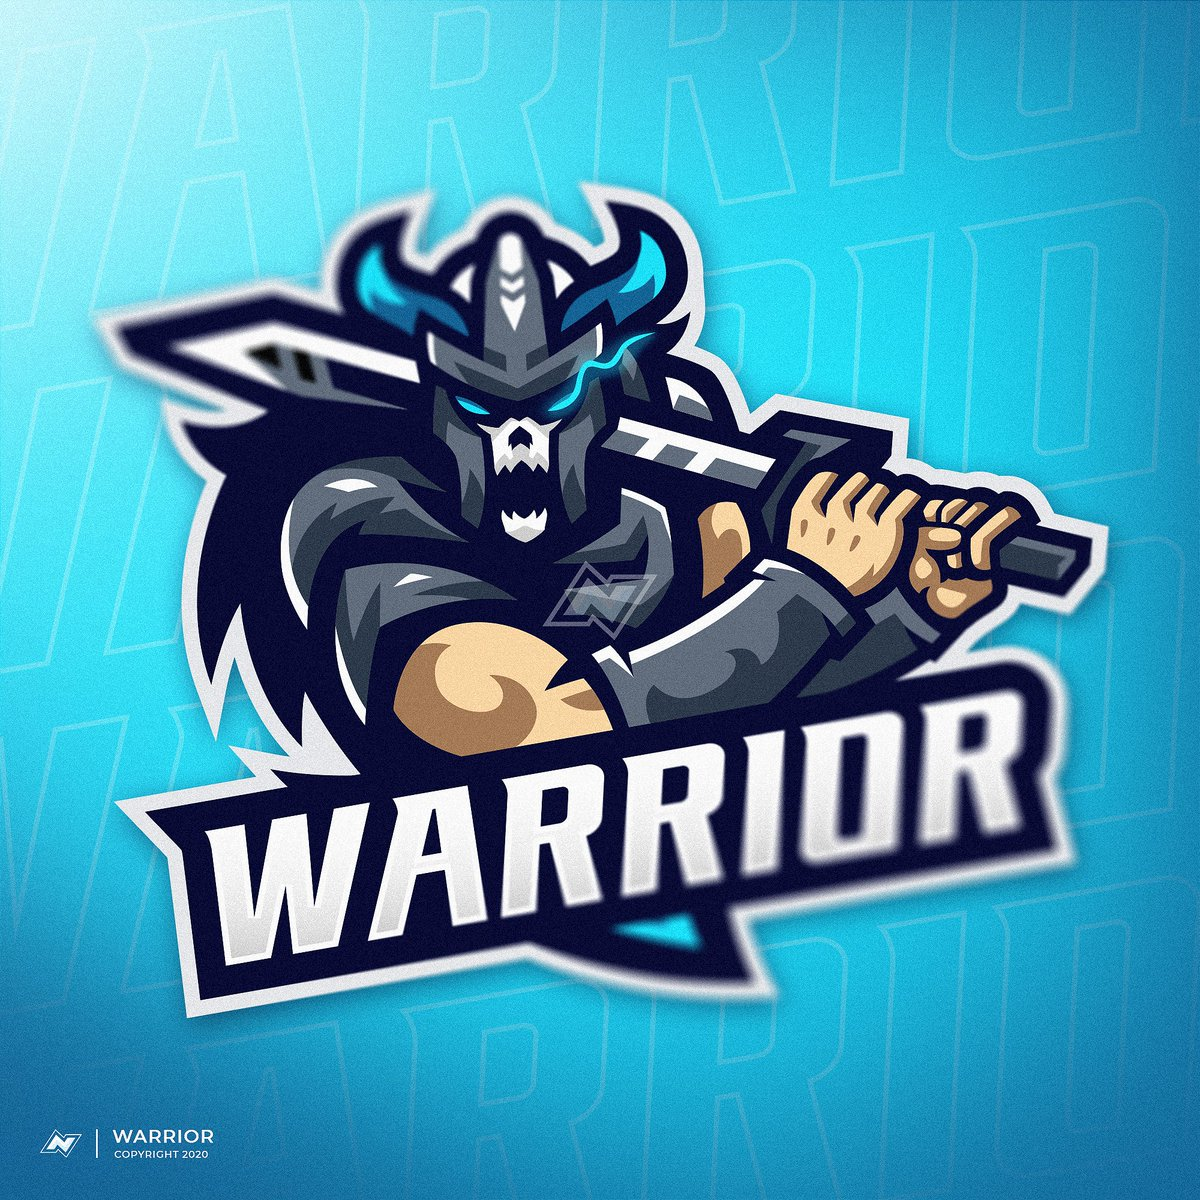 Skull Warrior esports mascot logo ( FOR SALE ) #gamingstreamers #streamers #gaming #apexlegends  #youtubegaming #mascotdesign #esportsdesign #gamers #spartanmascot #warrior #apexlegendsart #skull #gamingstreaming #gamingstreamer #twitchgamer #twitchgaming #TwitchStreamers https://t.co/XHKAJ5vYgv